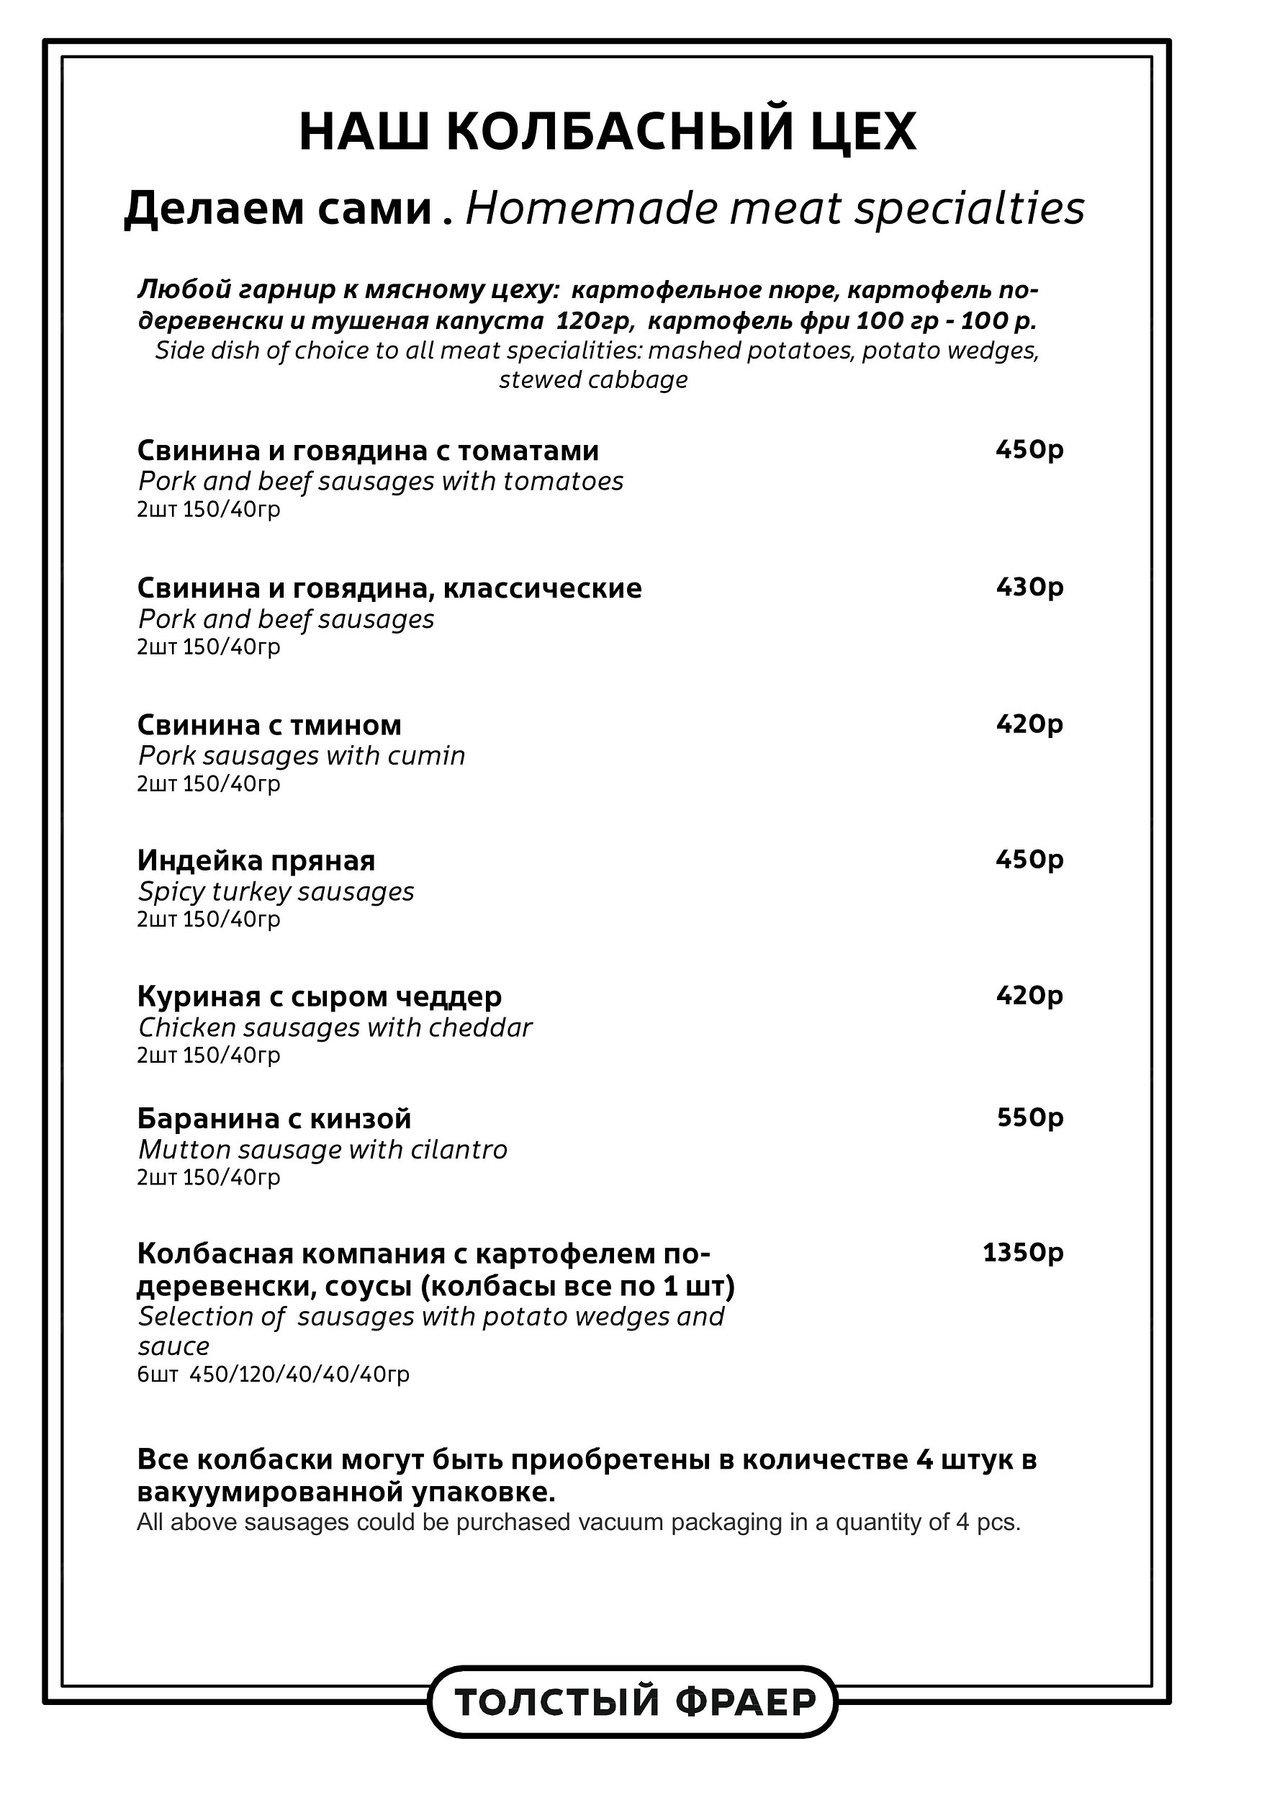 Меню ресторана Толстый Фраер на проспекте Луначарского фото 7